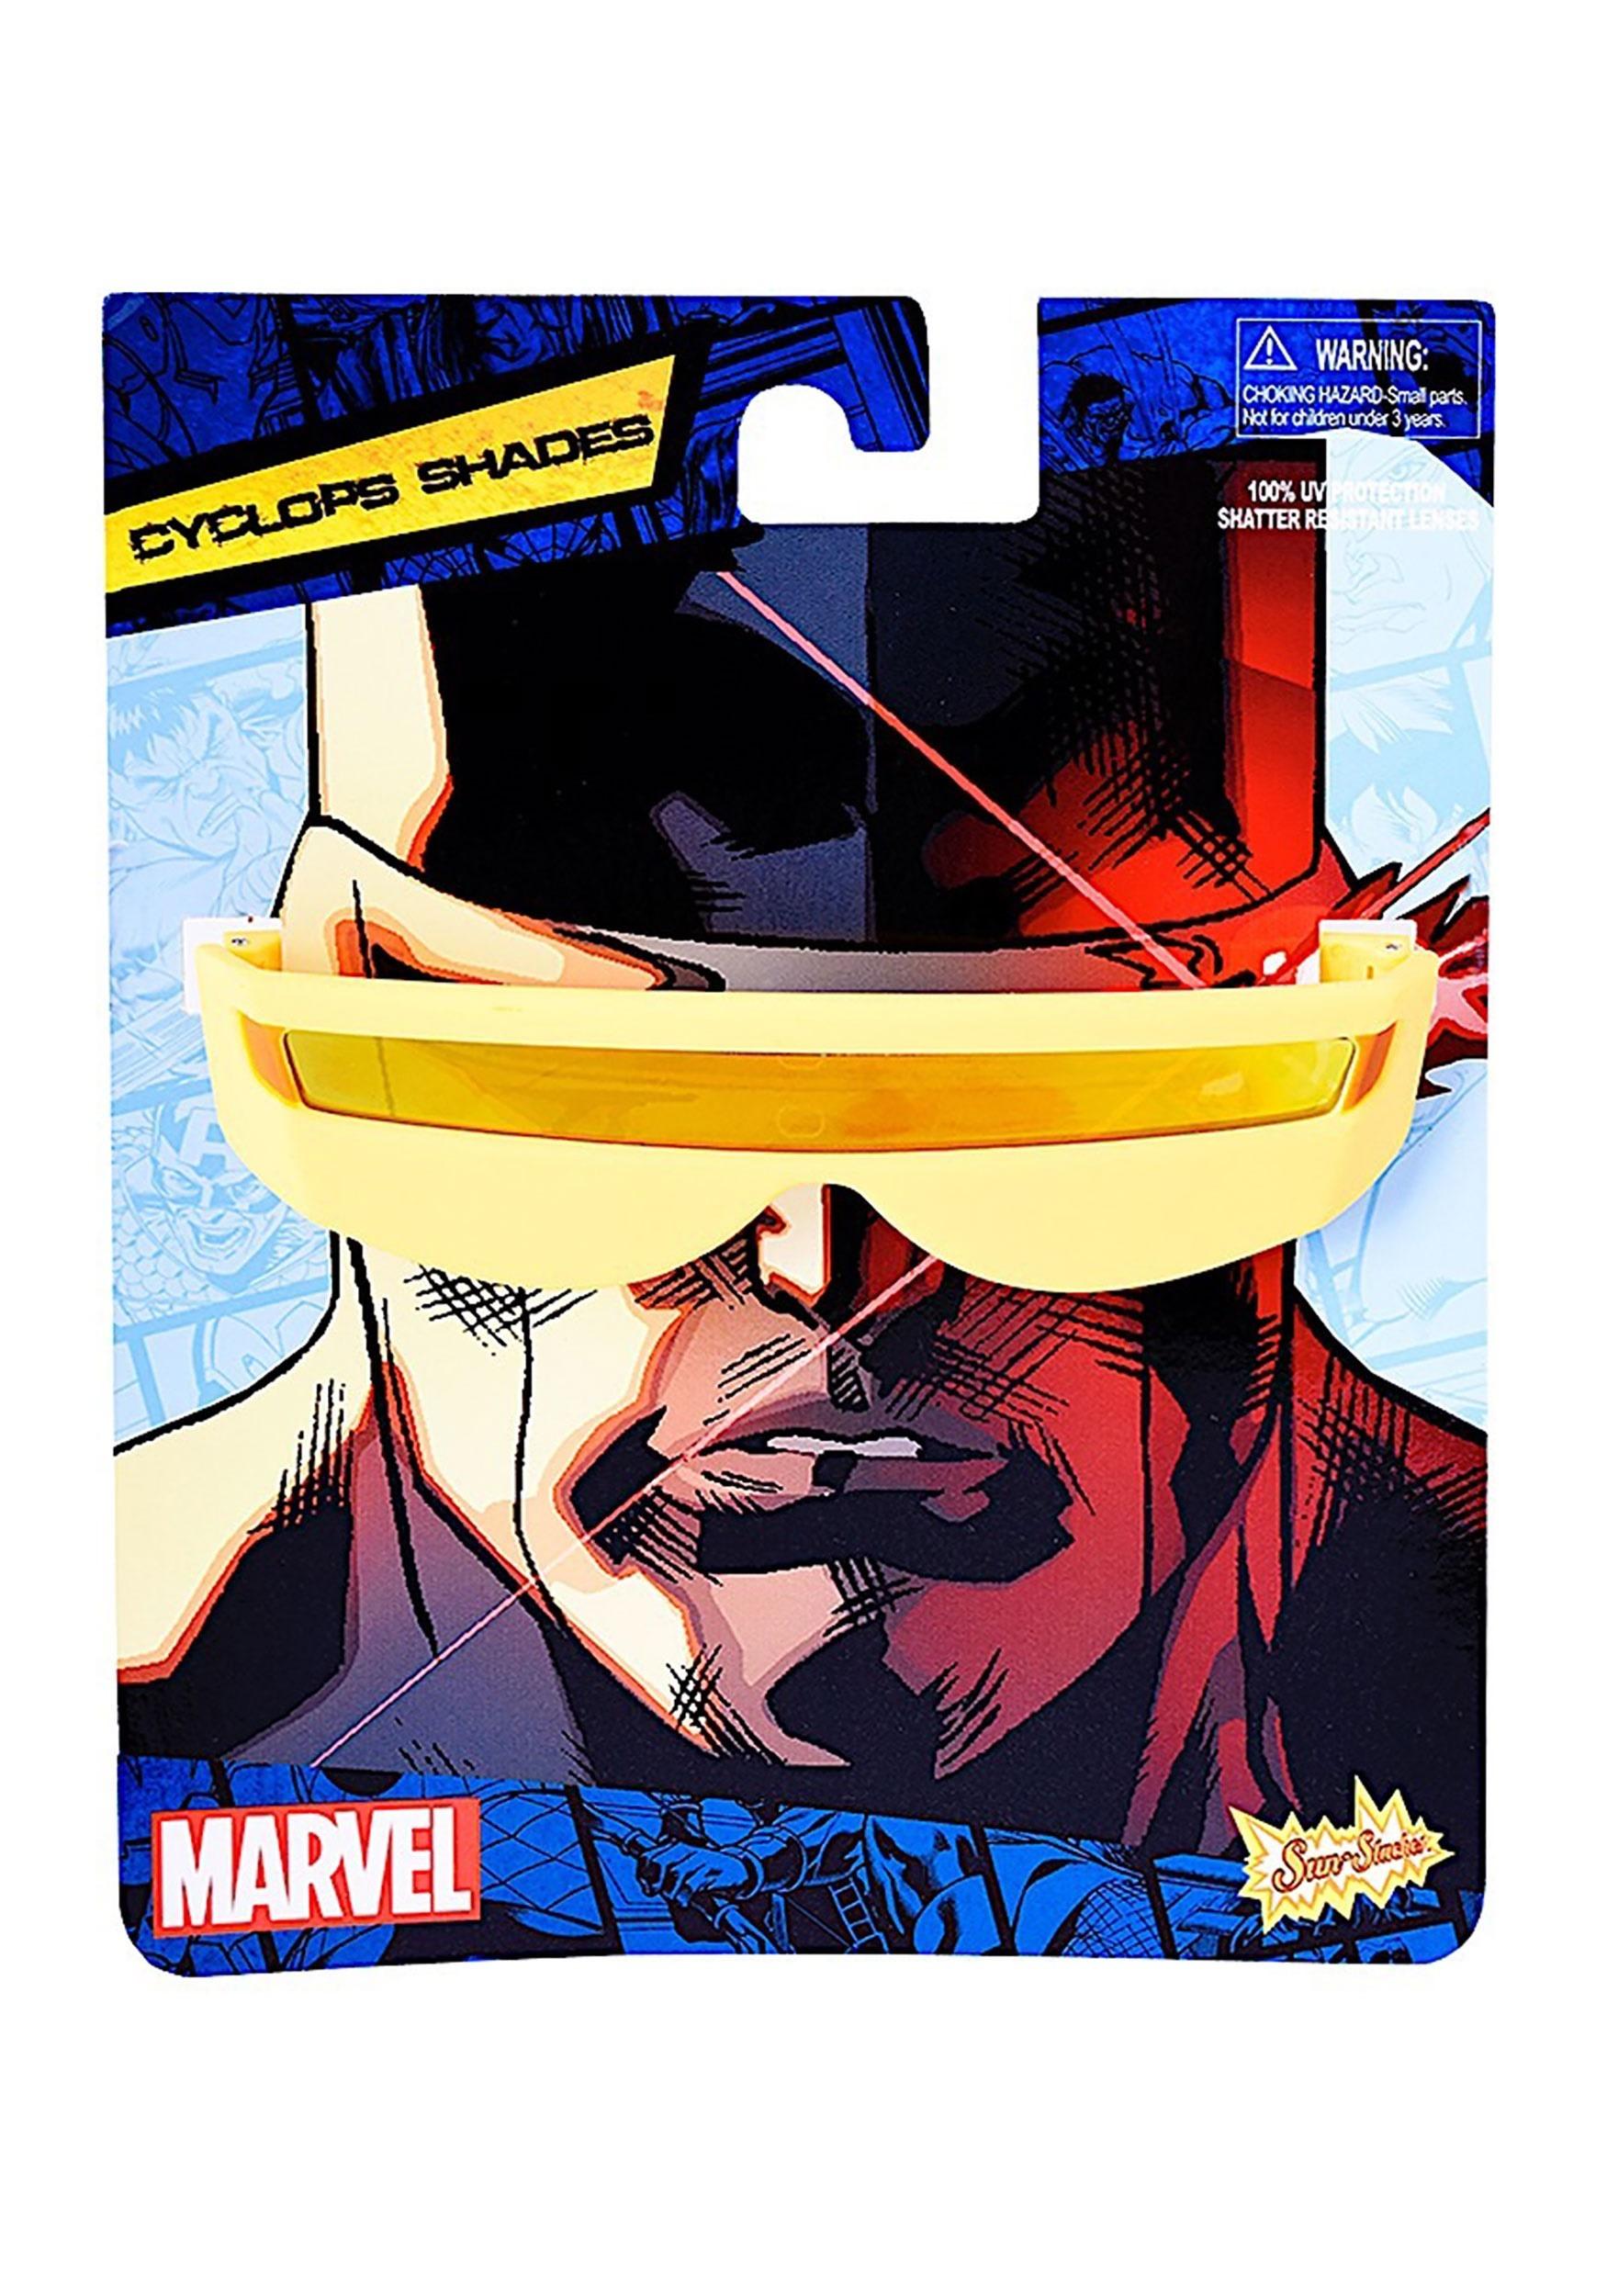 5e66798b2 marvel-x-men-cyclops-sunglasses.jpg